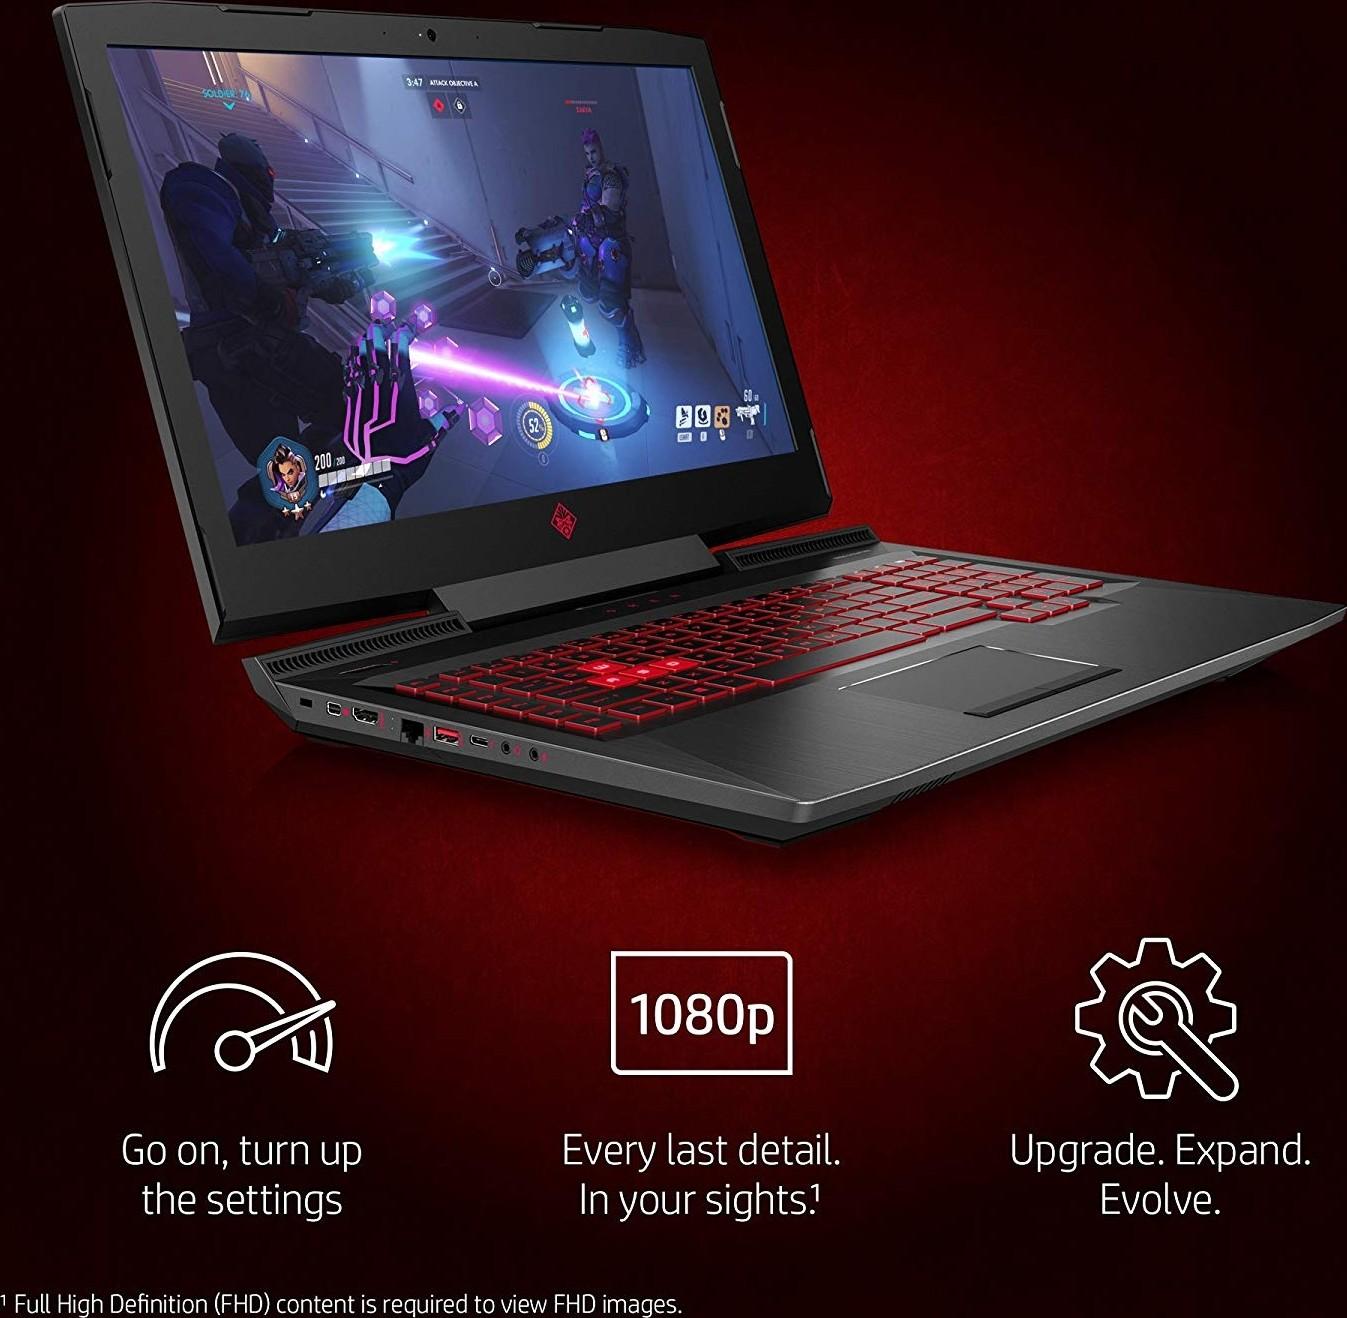 HP OMEN 17 Gaming Laptop, 17 3 Inch Display, 8th Generation Core i7 8750H,  12GB Ram, 1TB+128GB Hybri